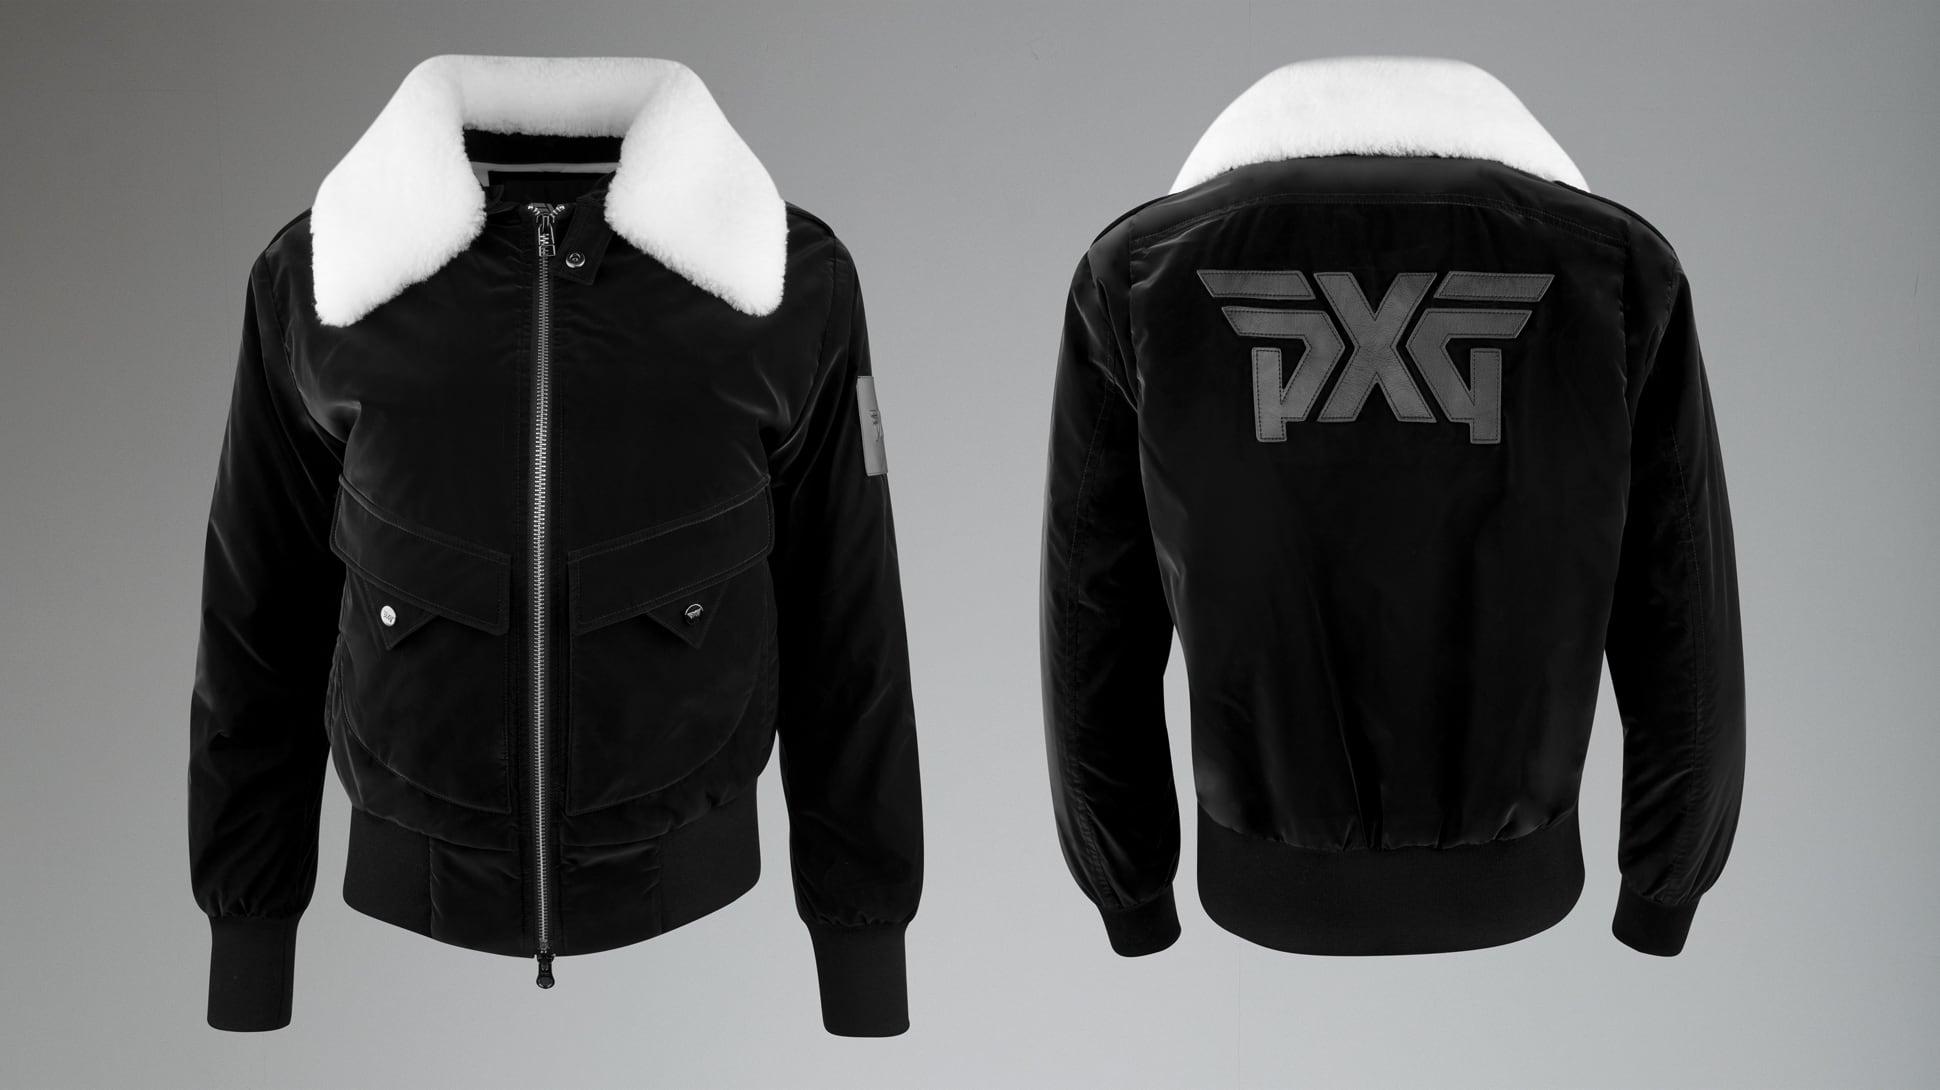 Winter-Ready Wool Bomber Jacket Image 1